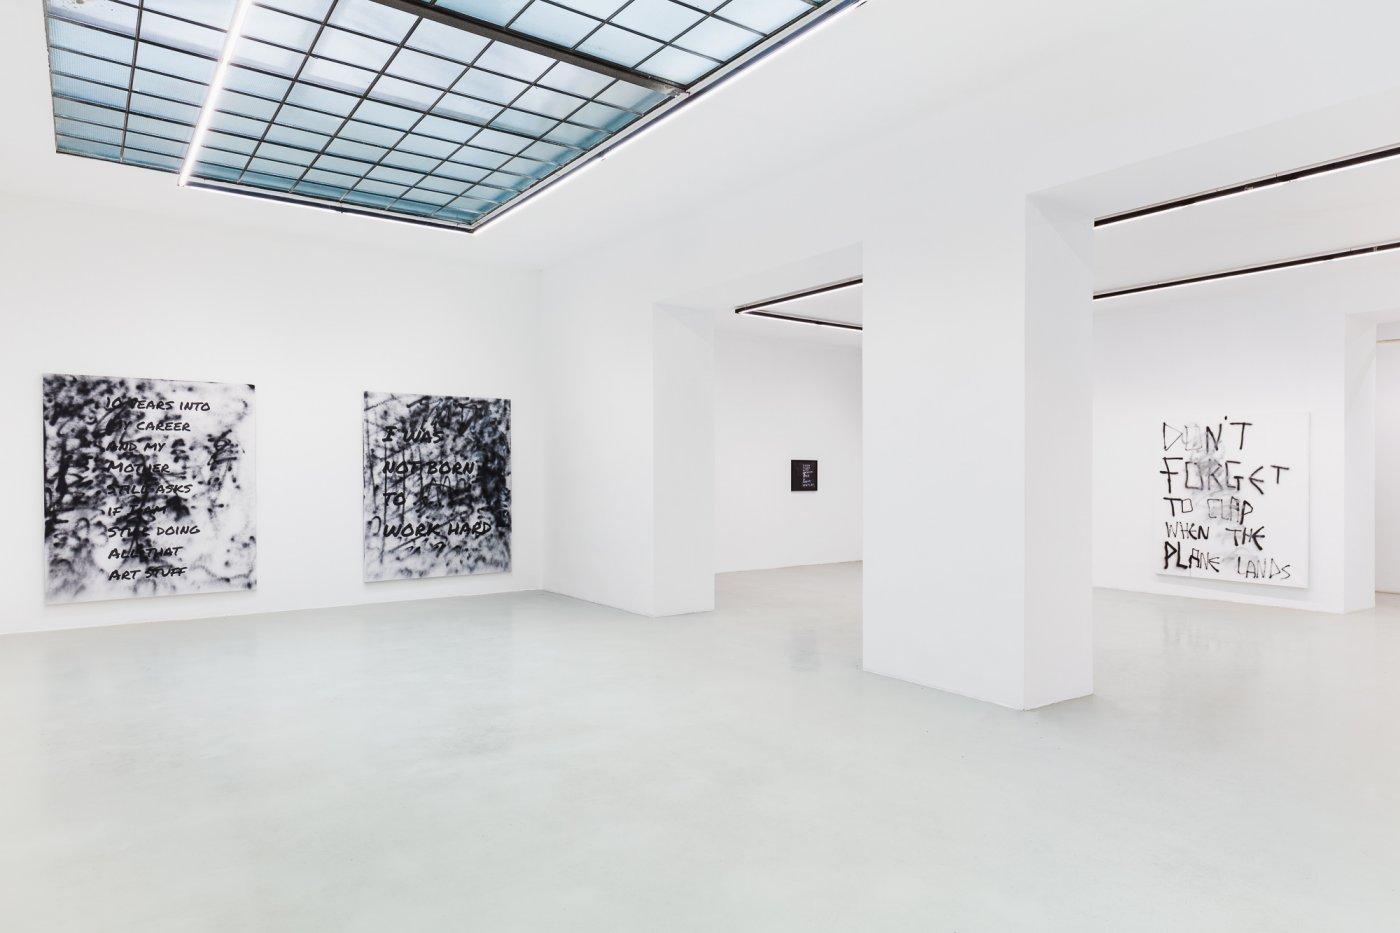 Galerie Lisa Kandlhofer